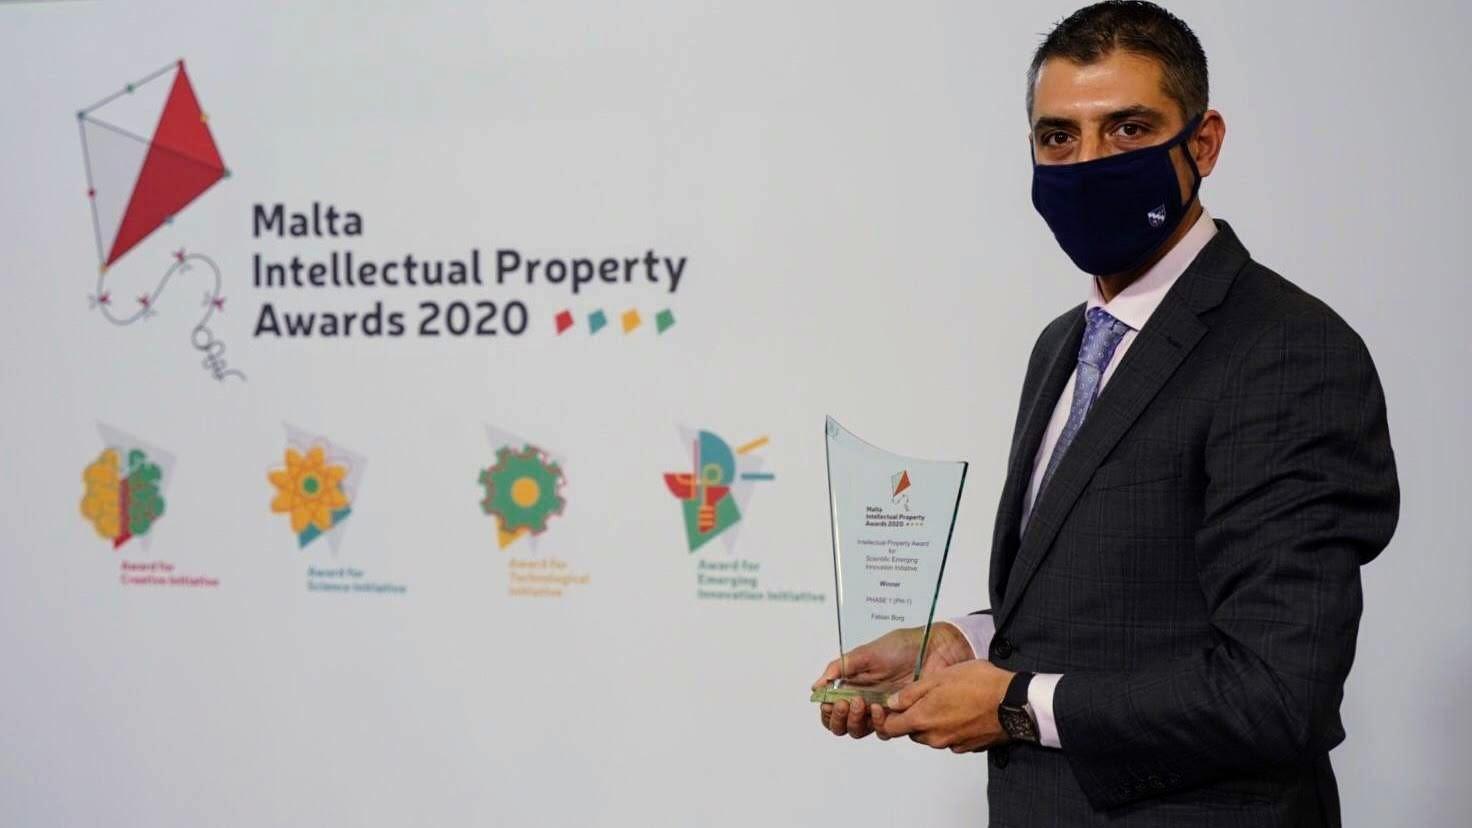 Malta Intellectual Property Award 2020